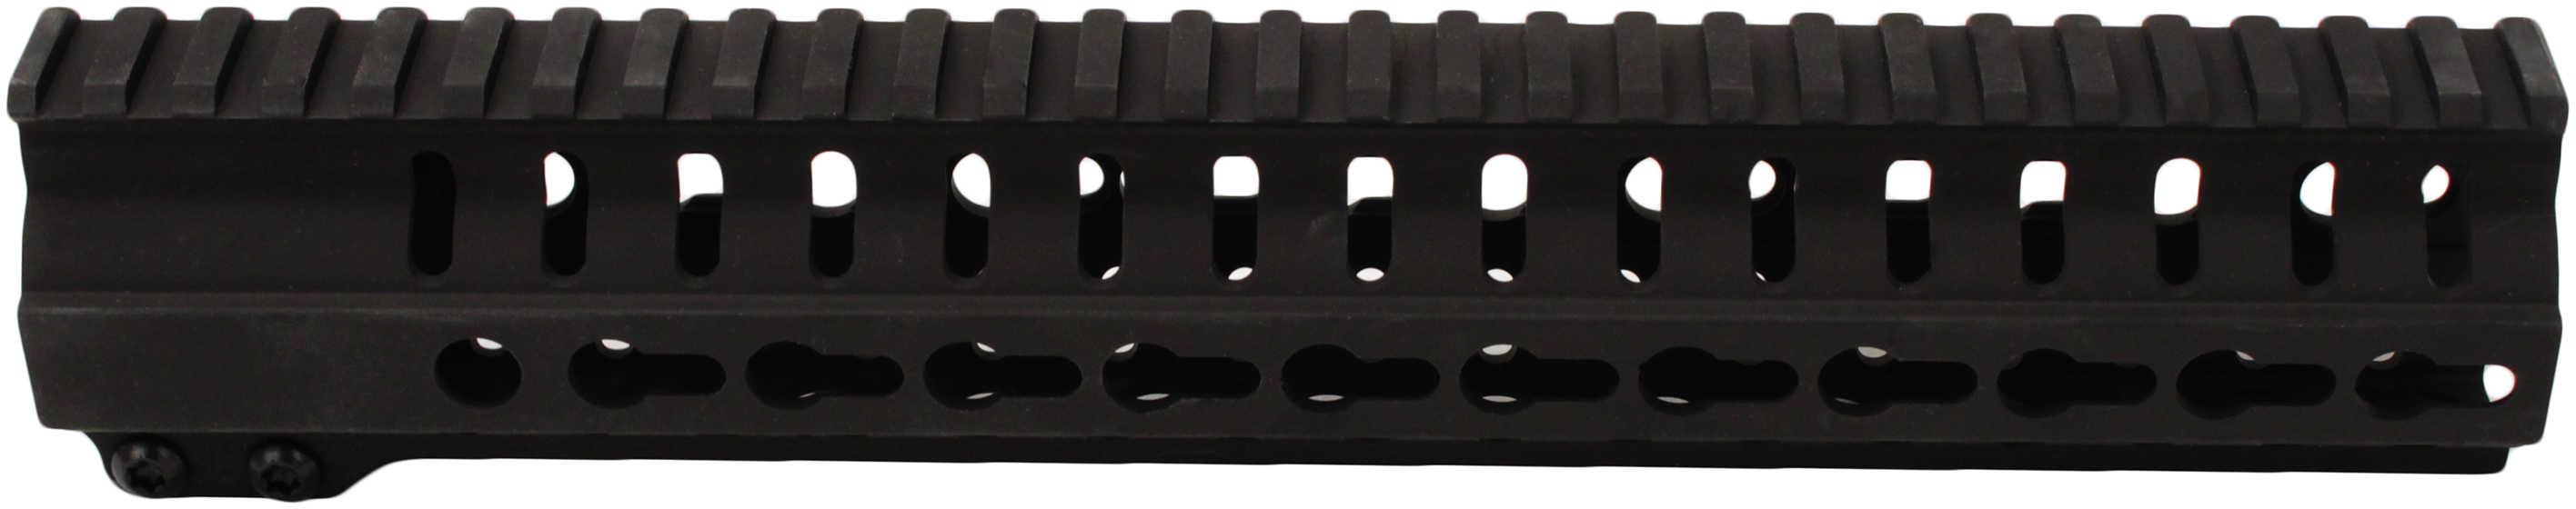 "CMMG, Inc AR-15 Hand Guard 11"" Free Floating Modular Handguard Aluminum Black RKM11 Key Mod 55DA2C4"